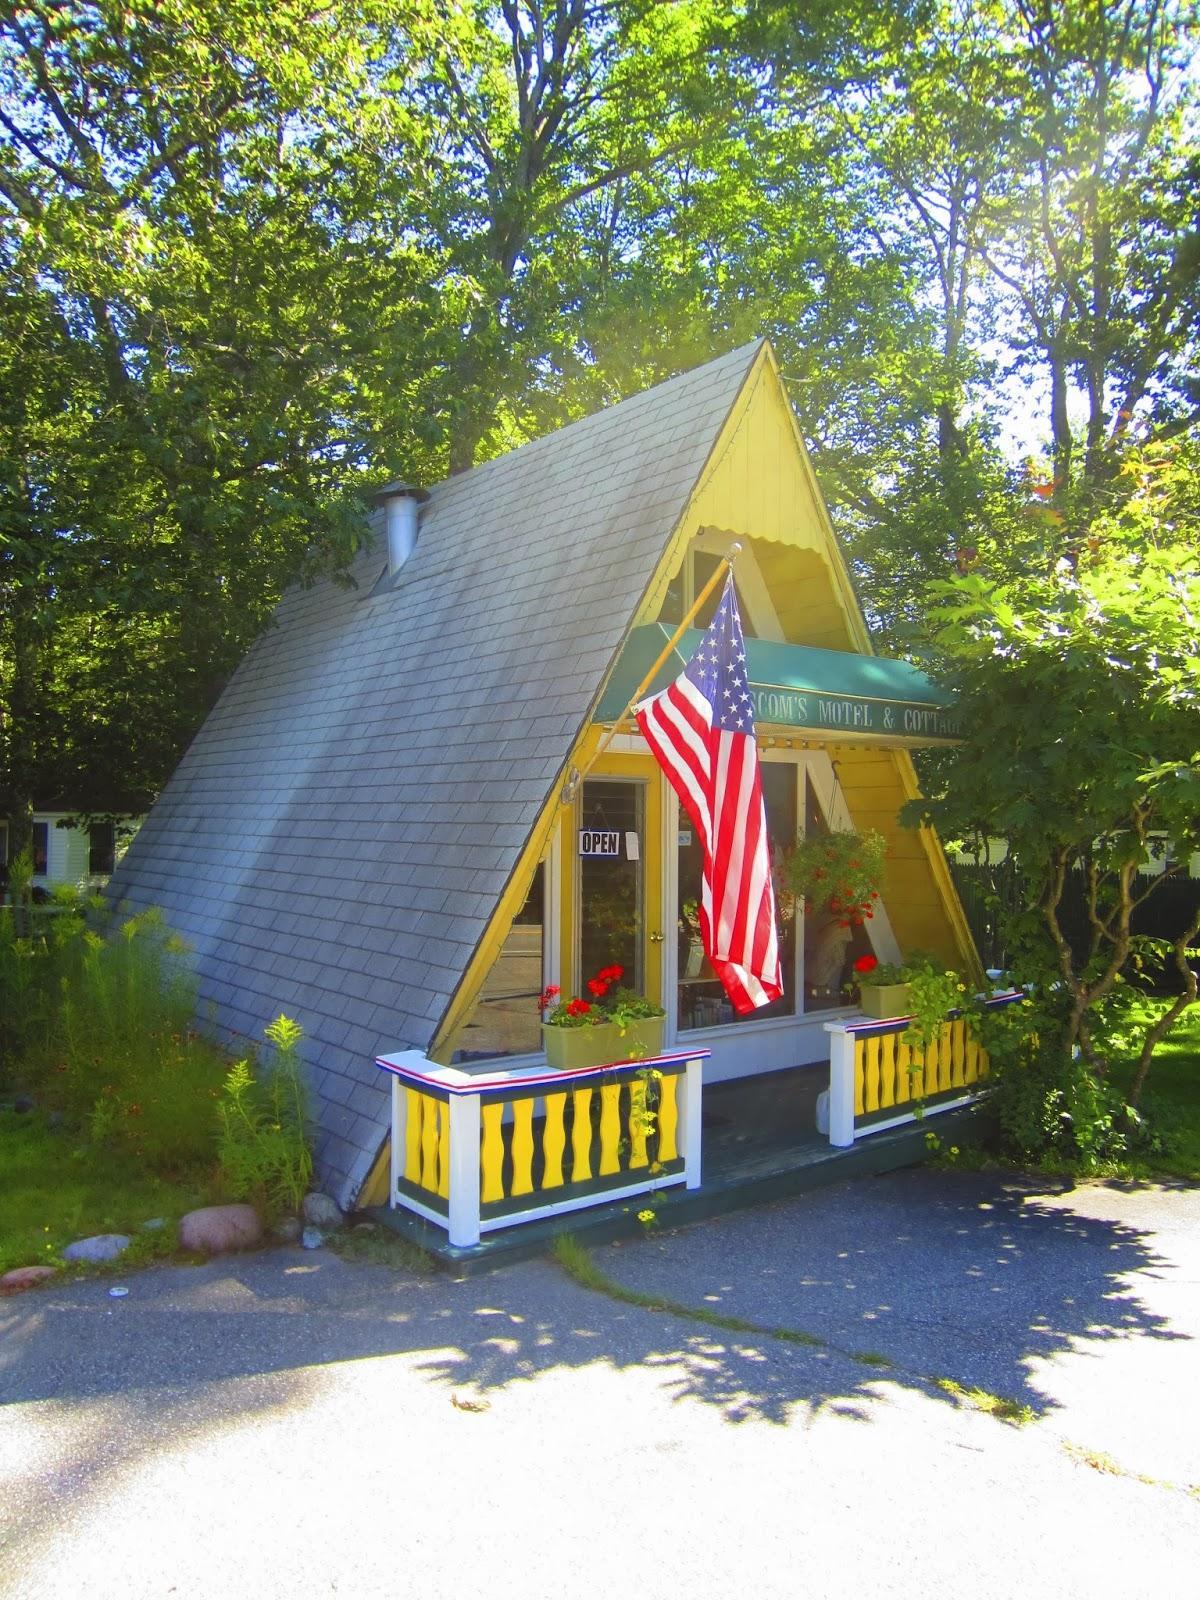 Tiny Home Designs: Relaxshacks.com: SIXTEEN Tiny Houses, A-frames, Huts, Art